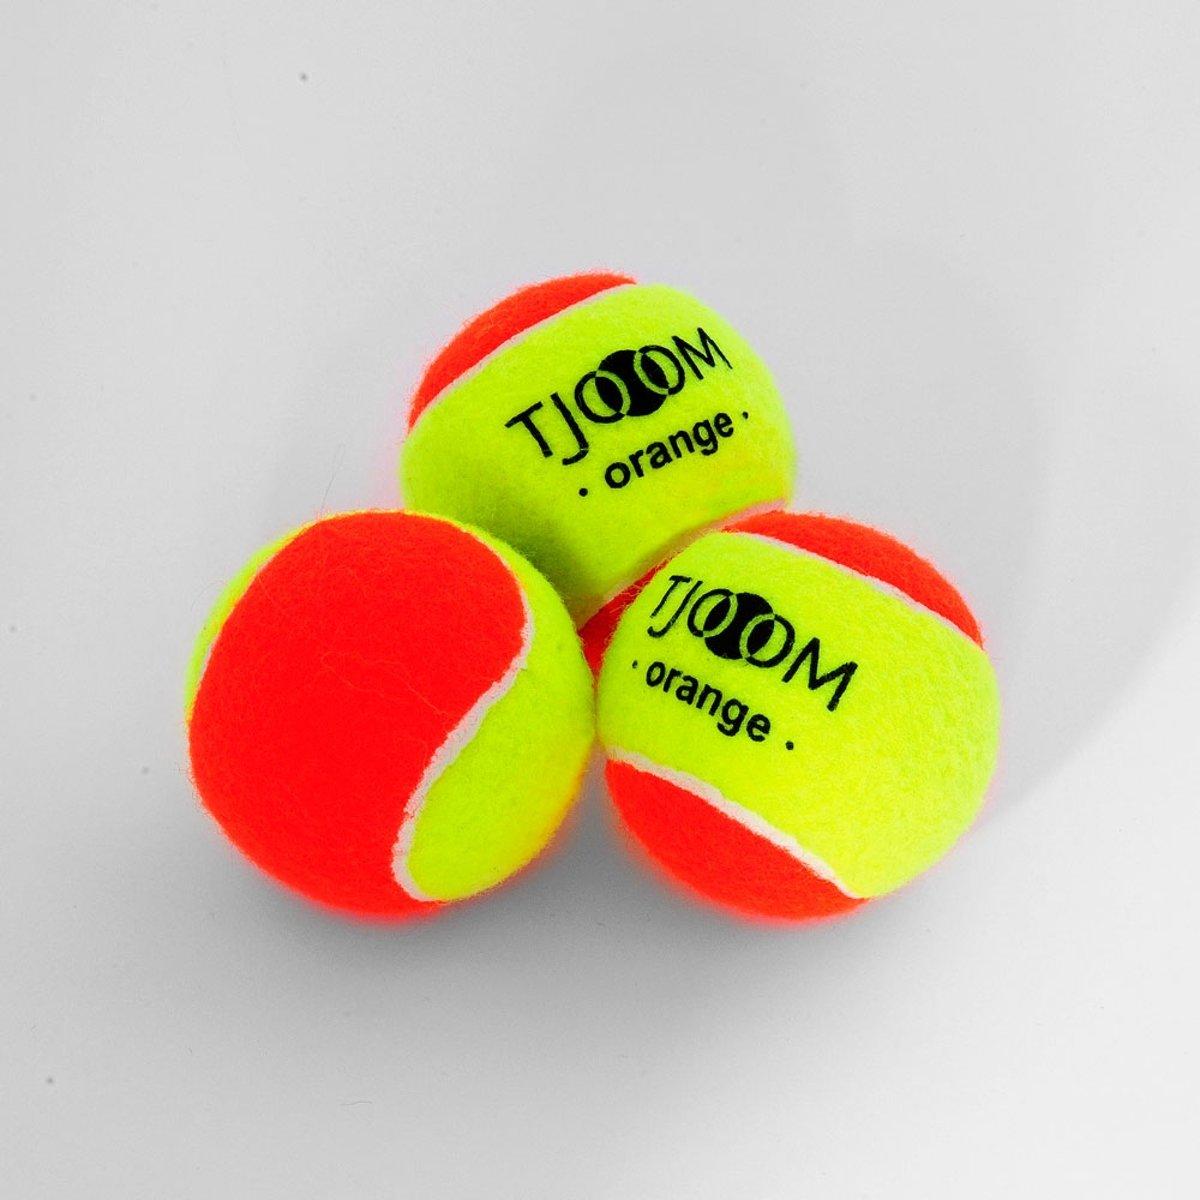 Tjoom orange - Stage 2 - Kidstennis - 60 ballen kopen